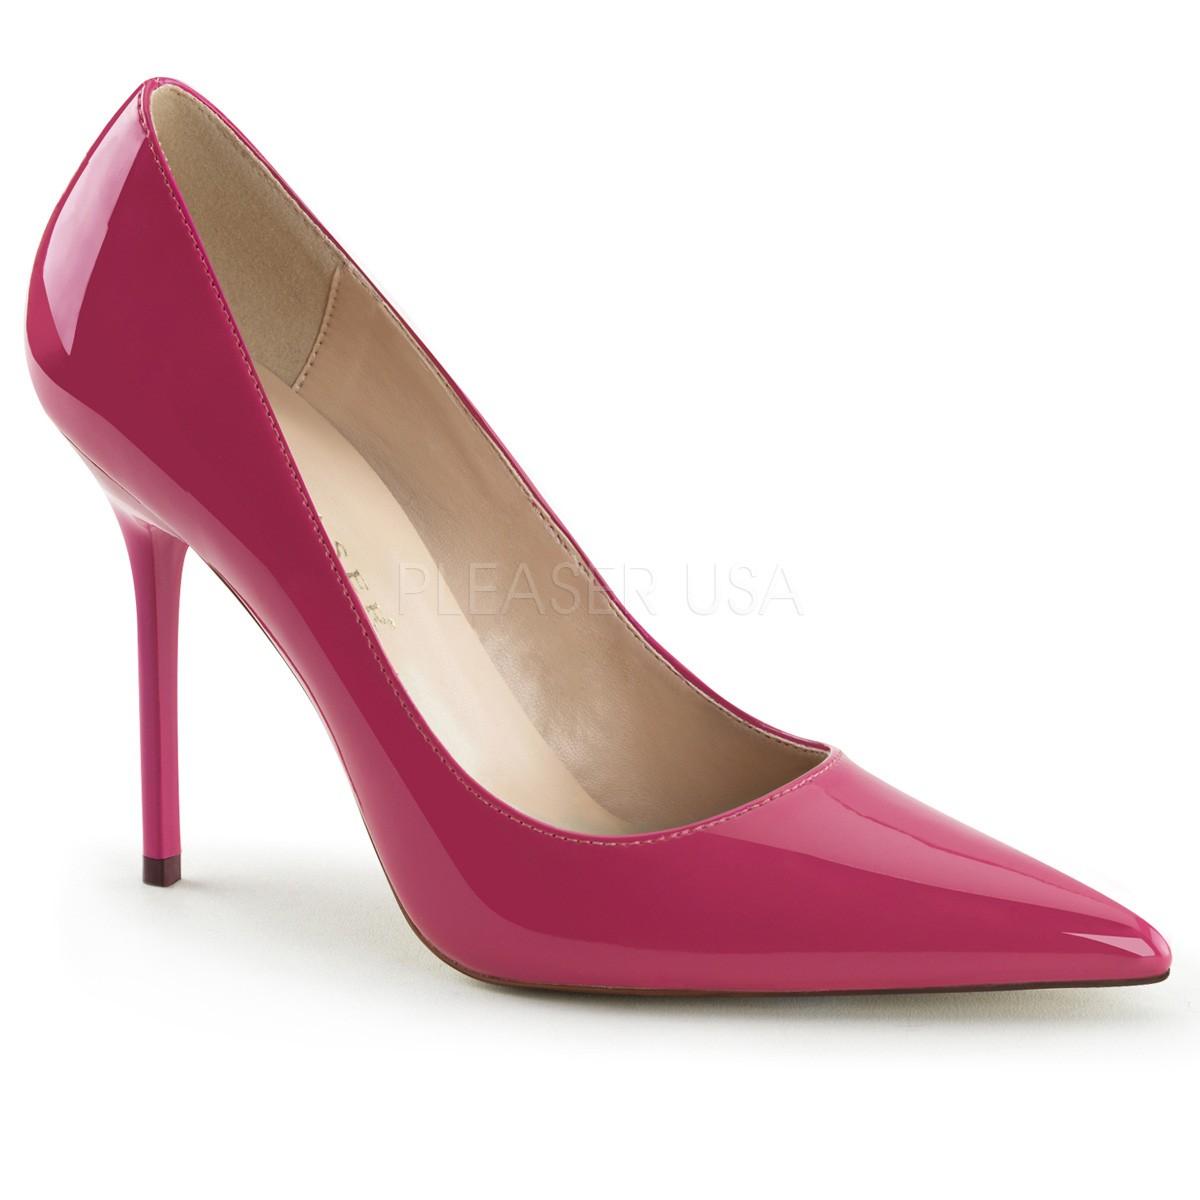 chaussure talon vernis sandale talon plateforme rouge vernis delight. Black Bedroom Furniture Sets. Home Design Ideas